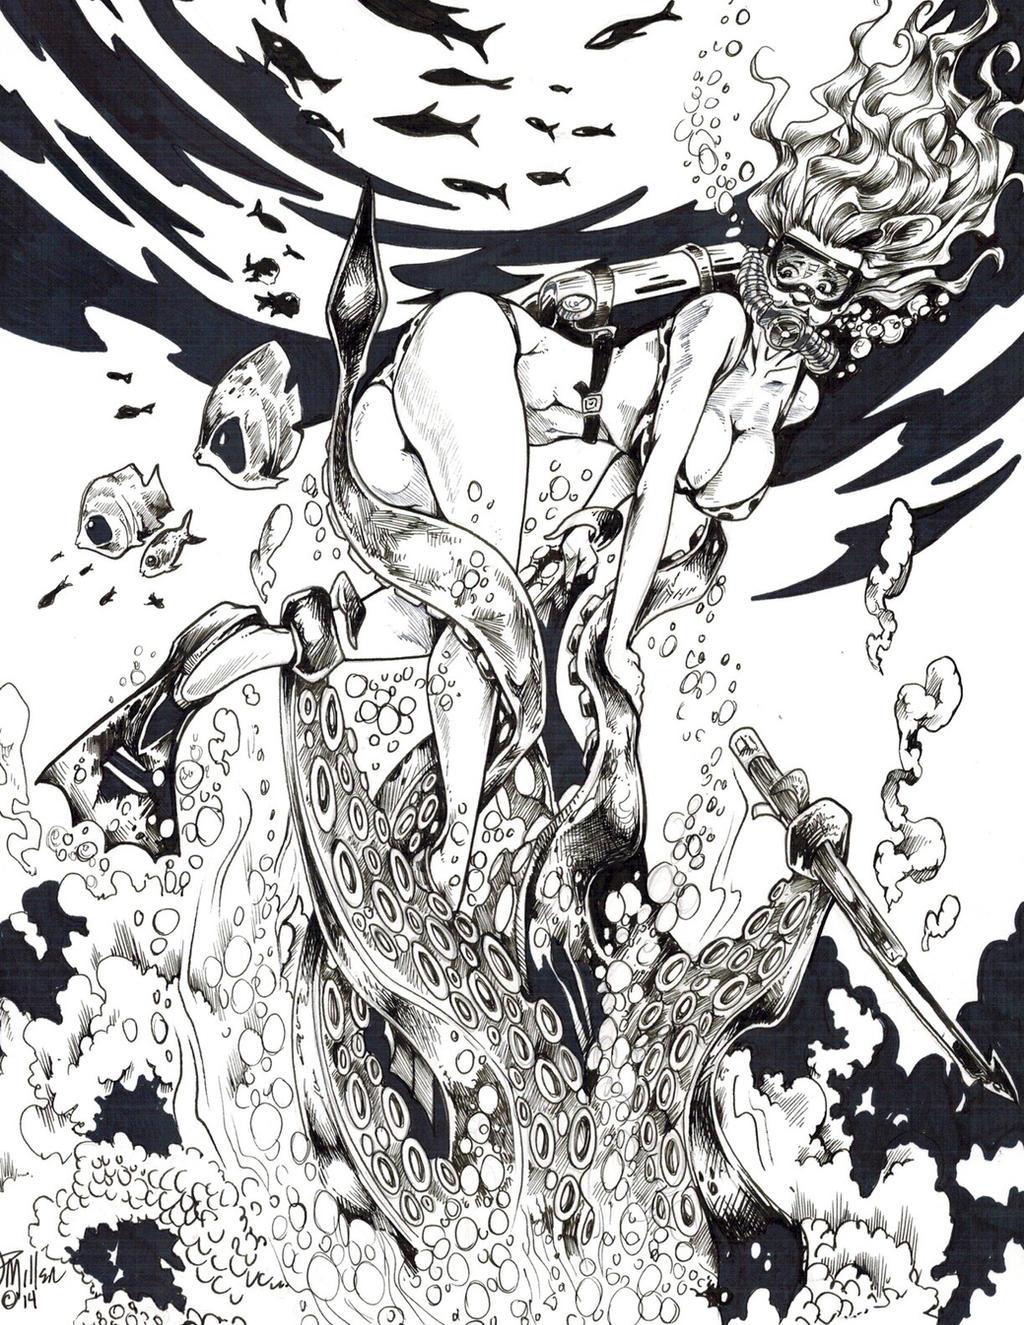 Kraken Fast Food by DW Miller by ConceptsByMiller